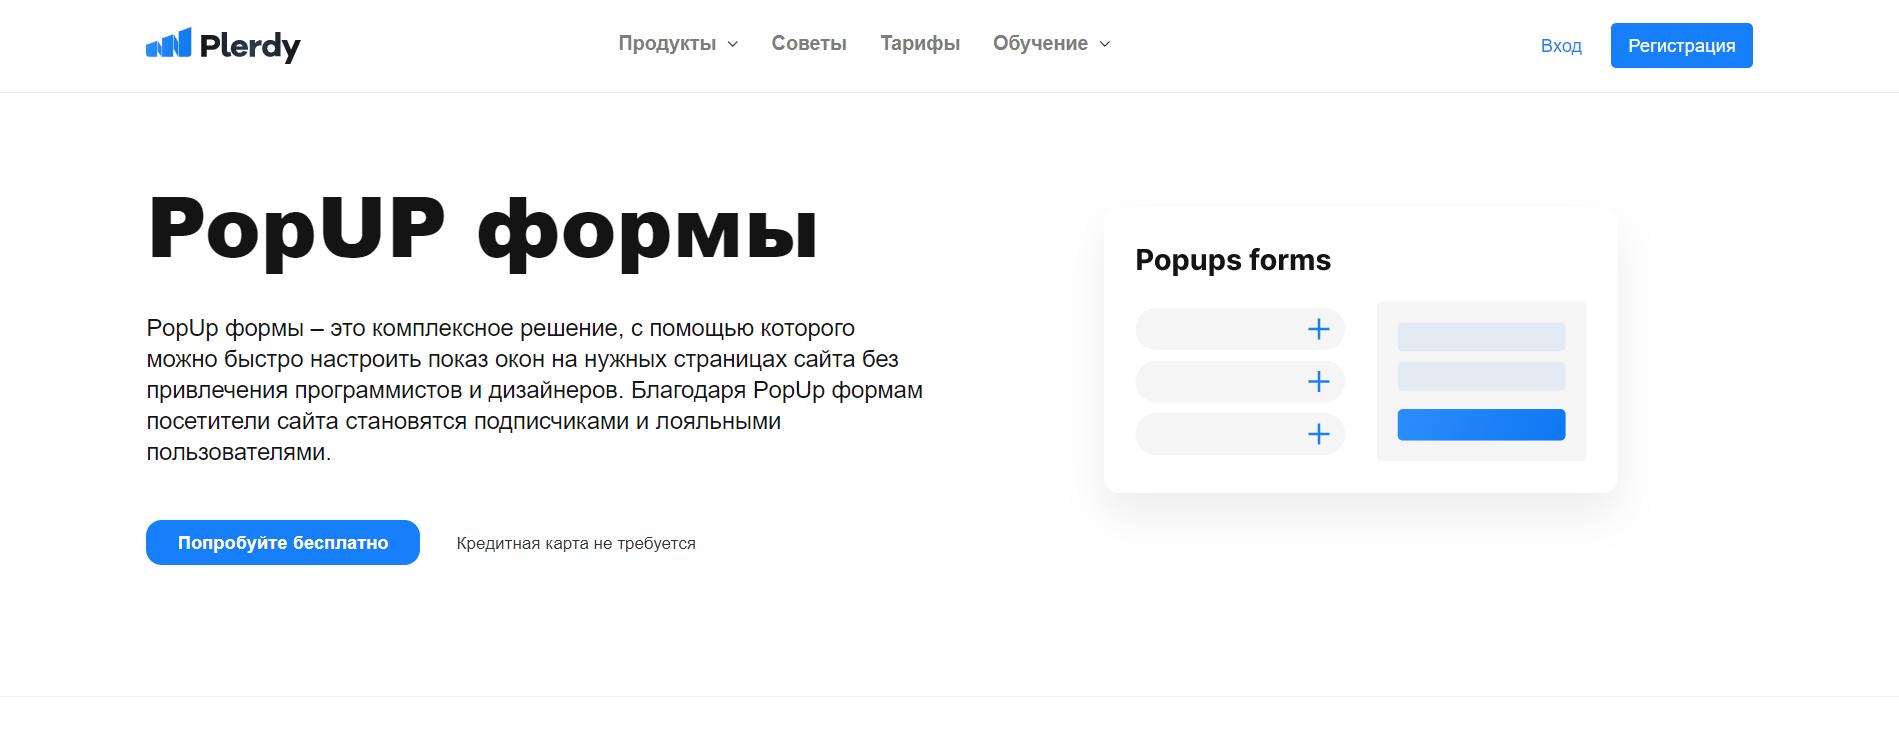 Plerdy сервис для создания pop-up окна